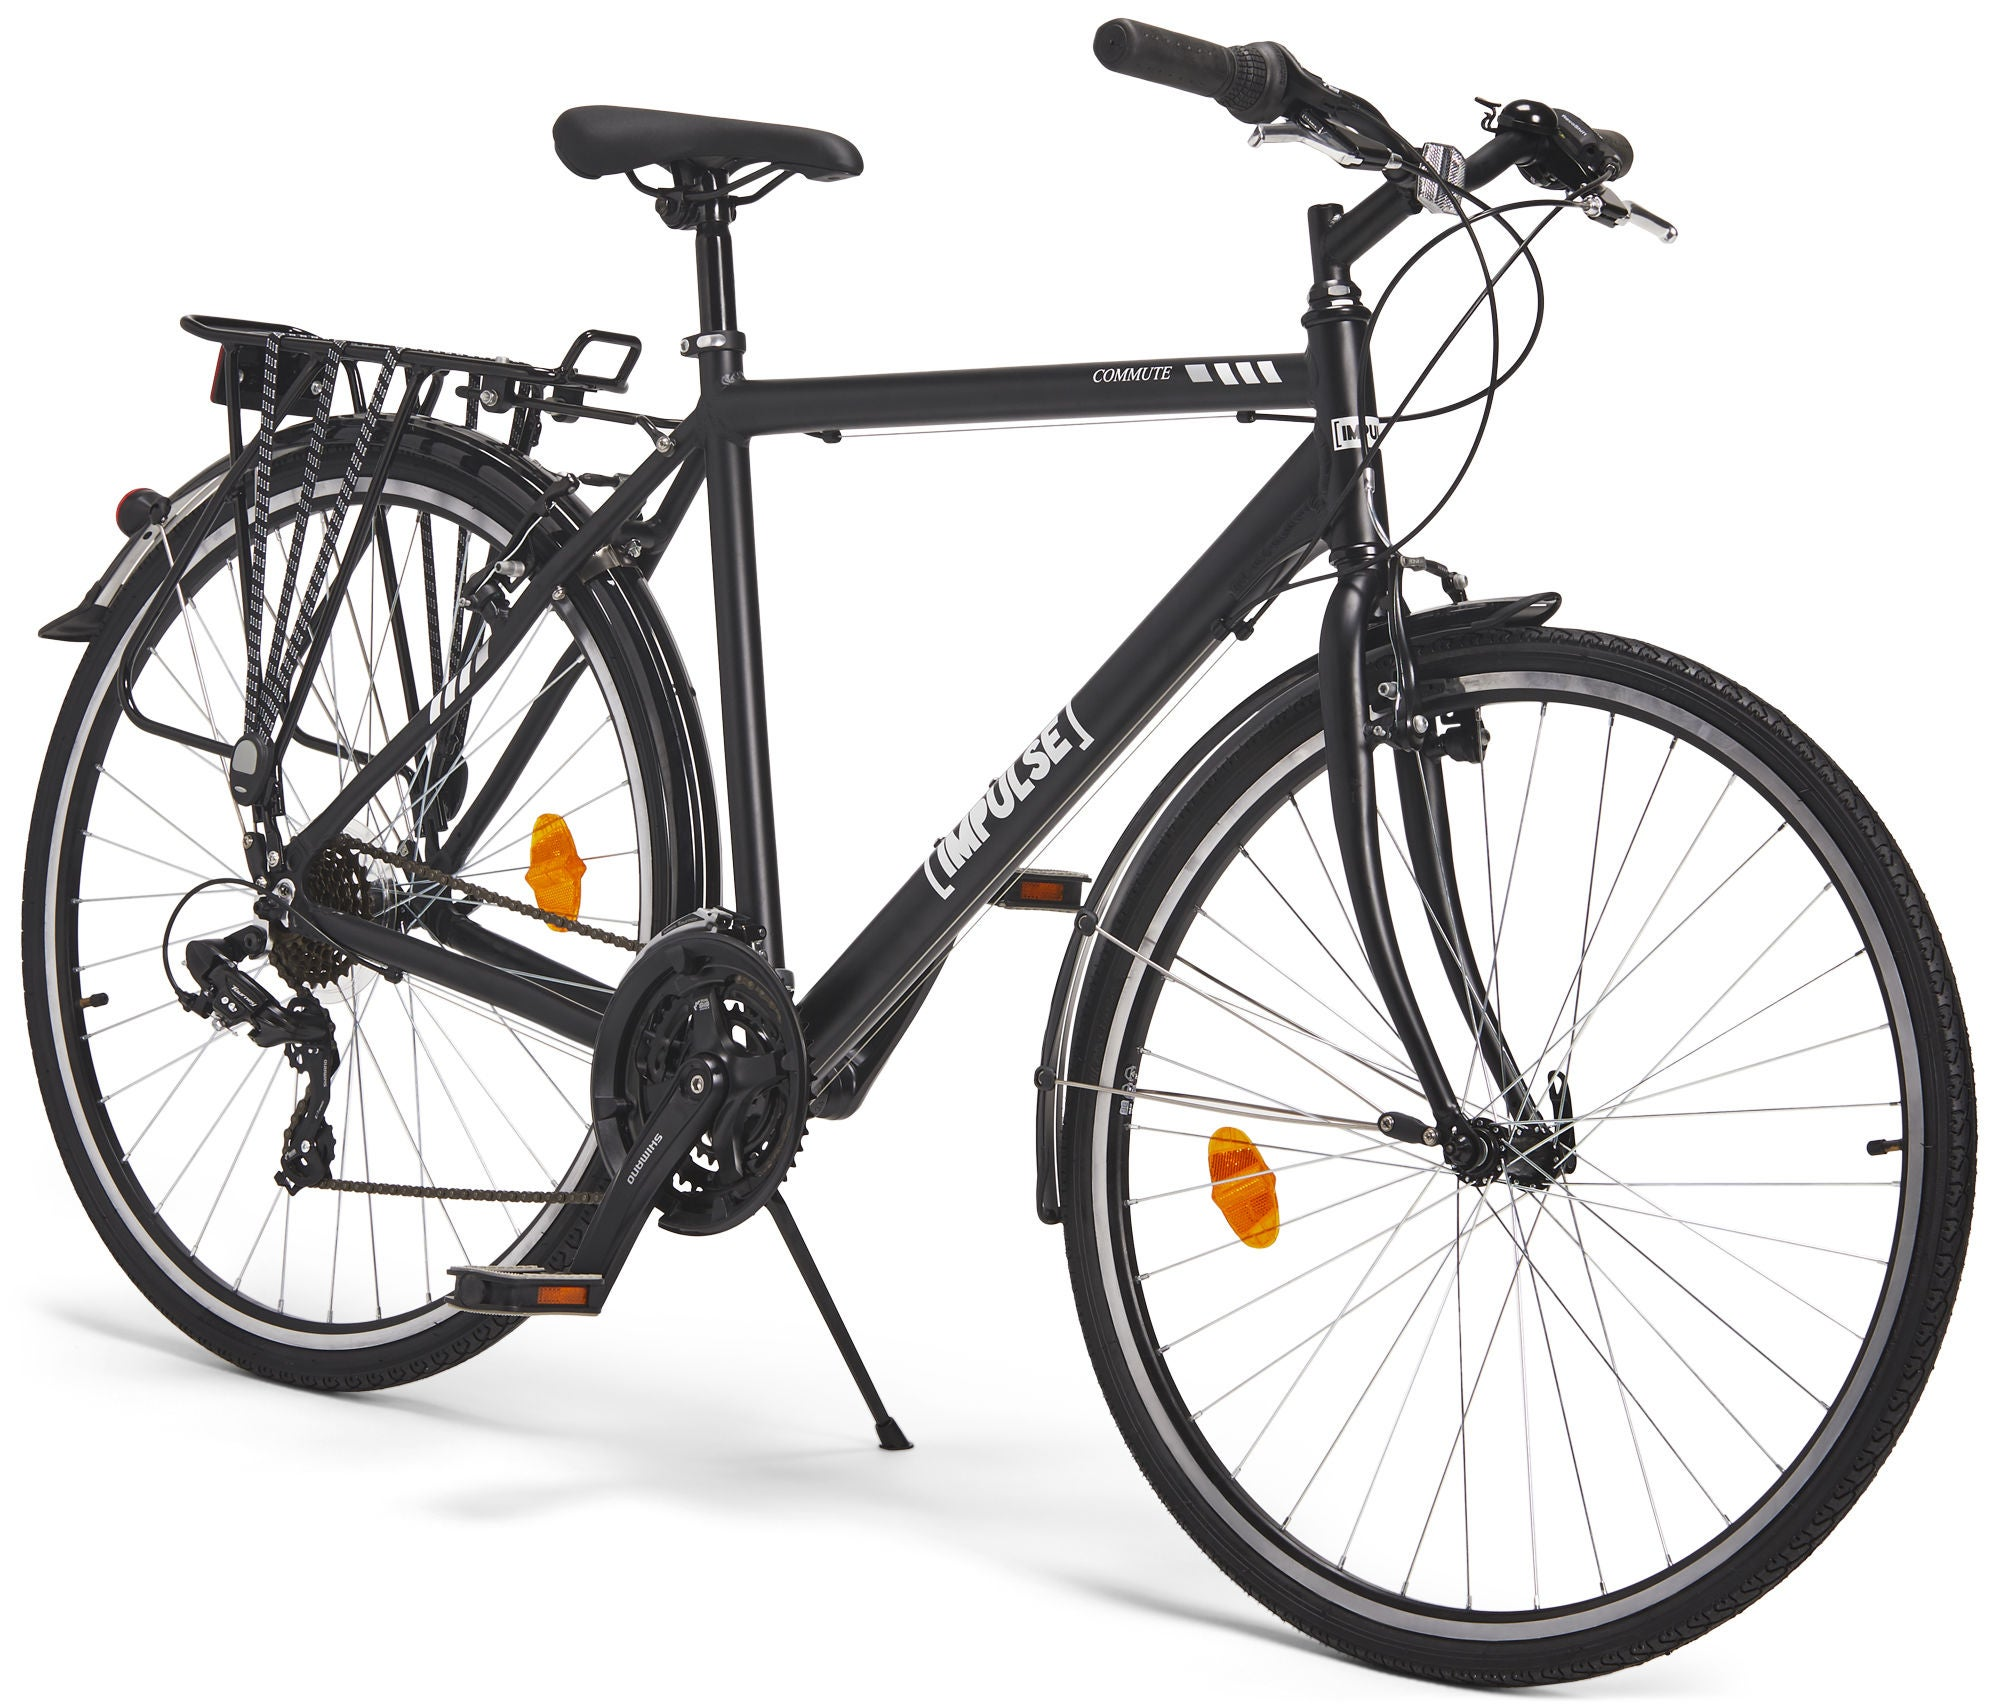 Køb Impulse Premium Commute Cykel 28 Tommer, Black | City